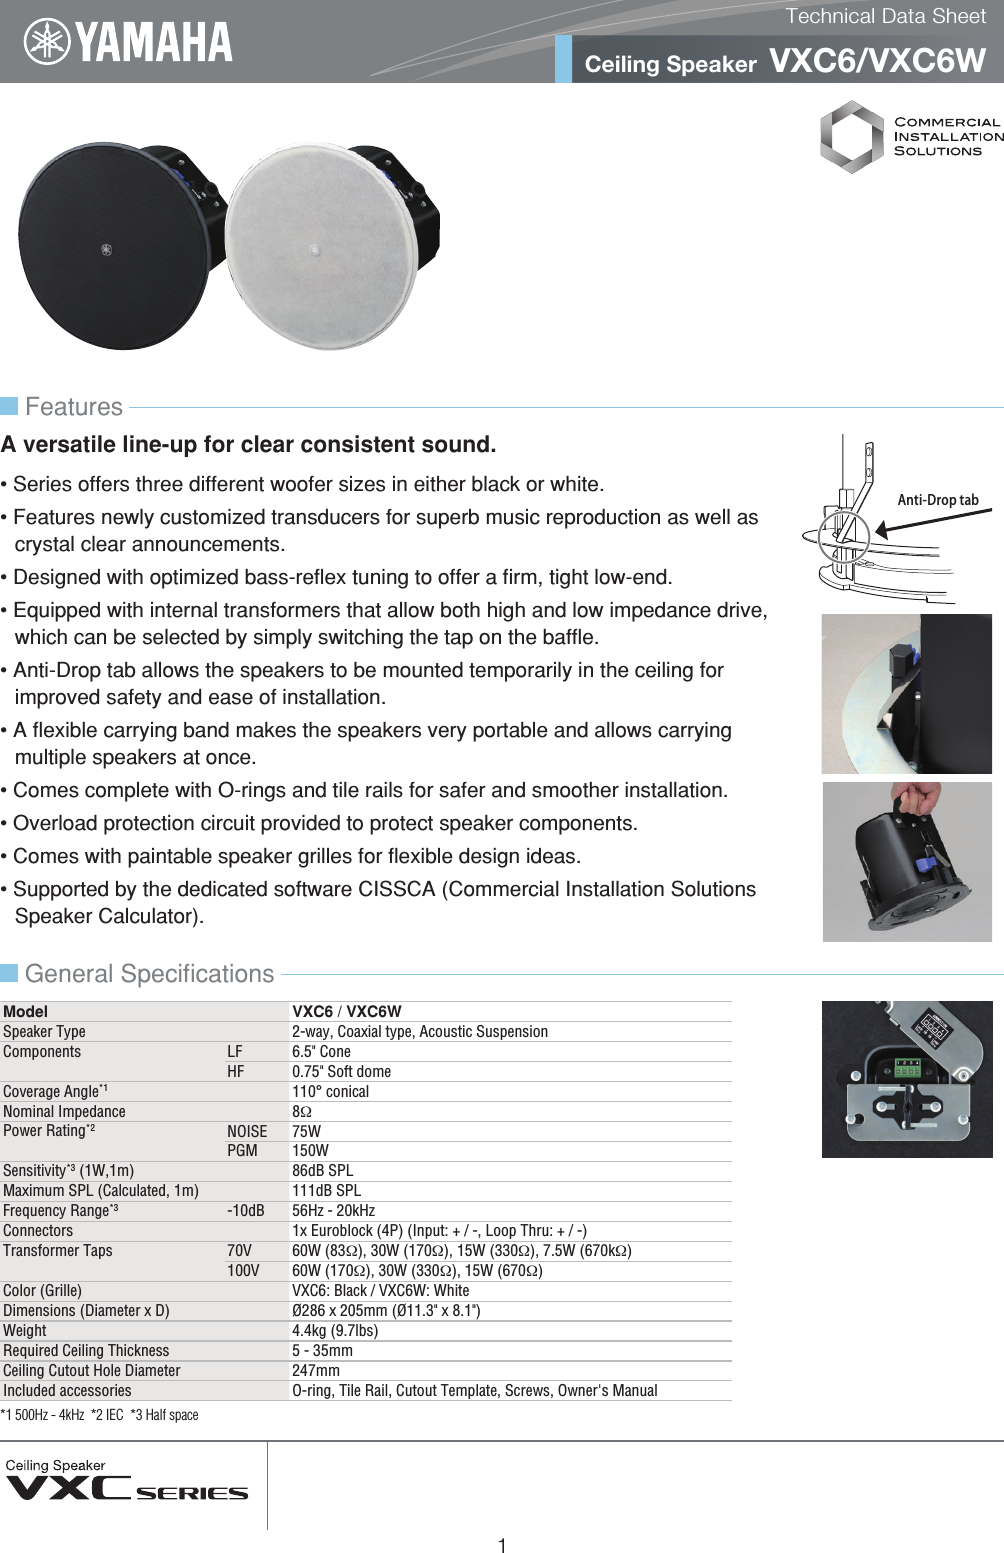 Yamaha VXC6 Technical Data Sheet Datasheet En